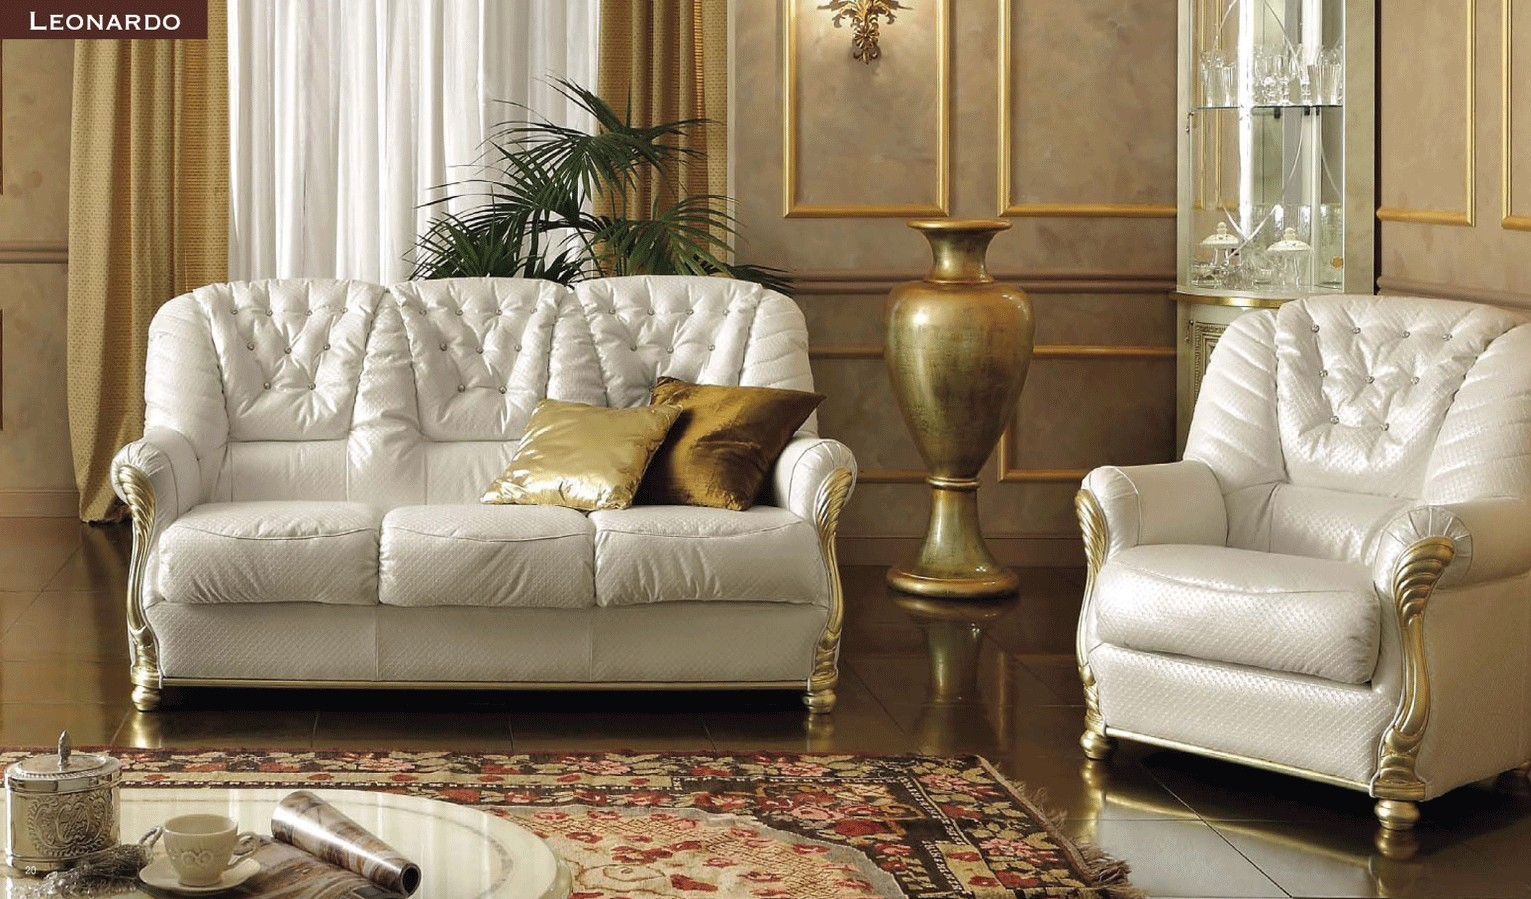 Leonardo Italian Living Room Set with Swarovski Crystals